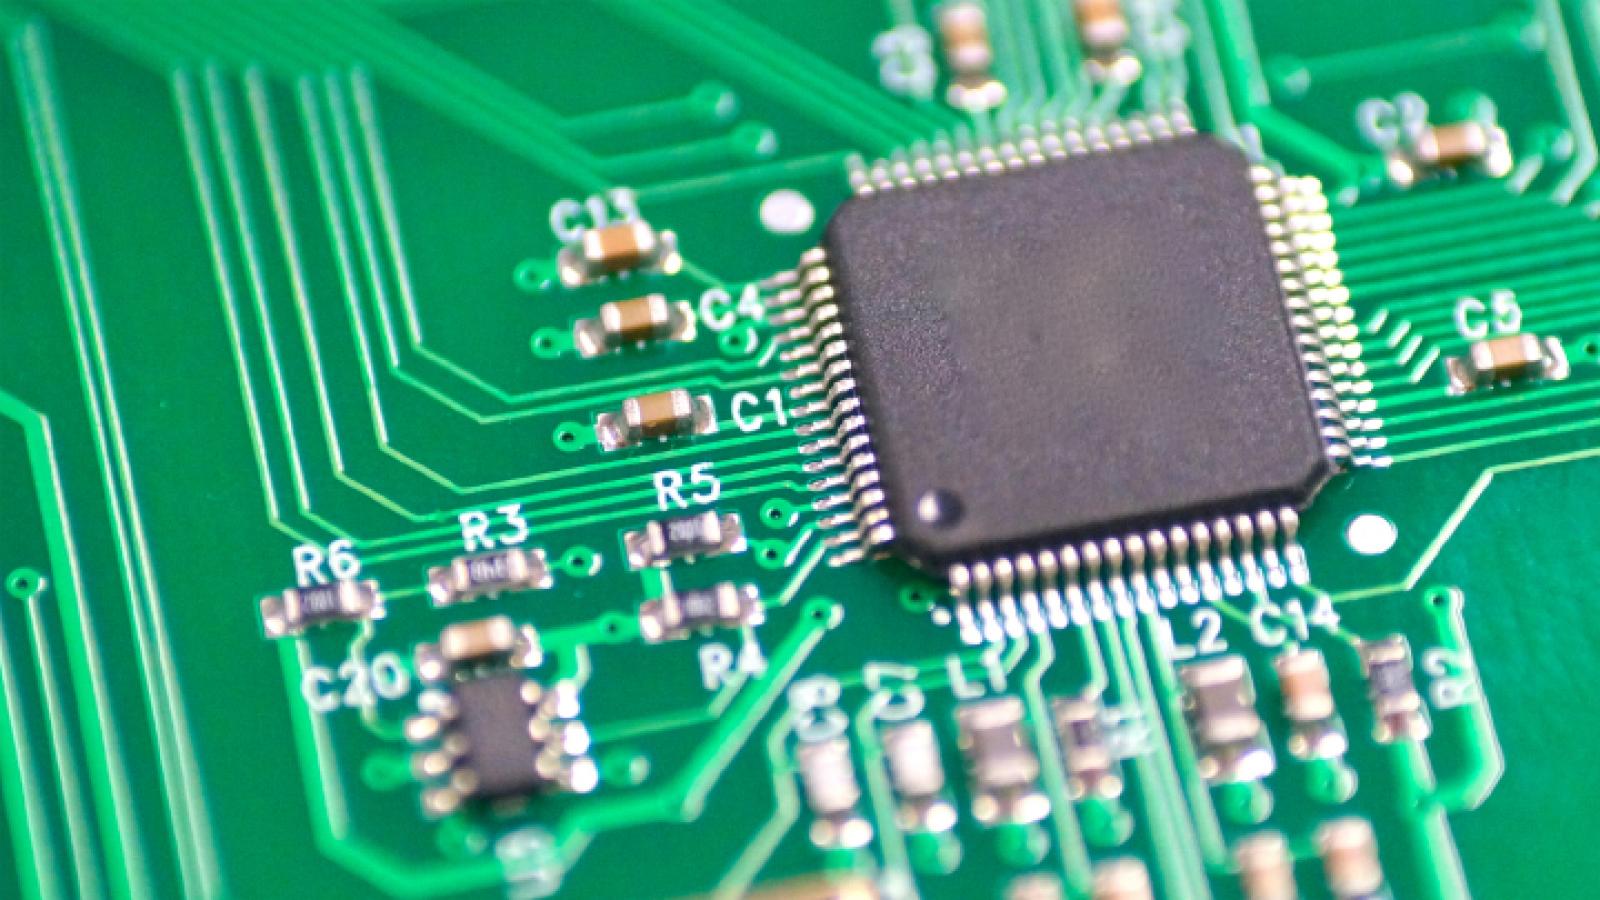 A circuit board/semiconductor